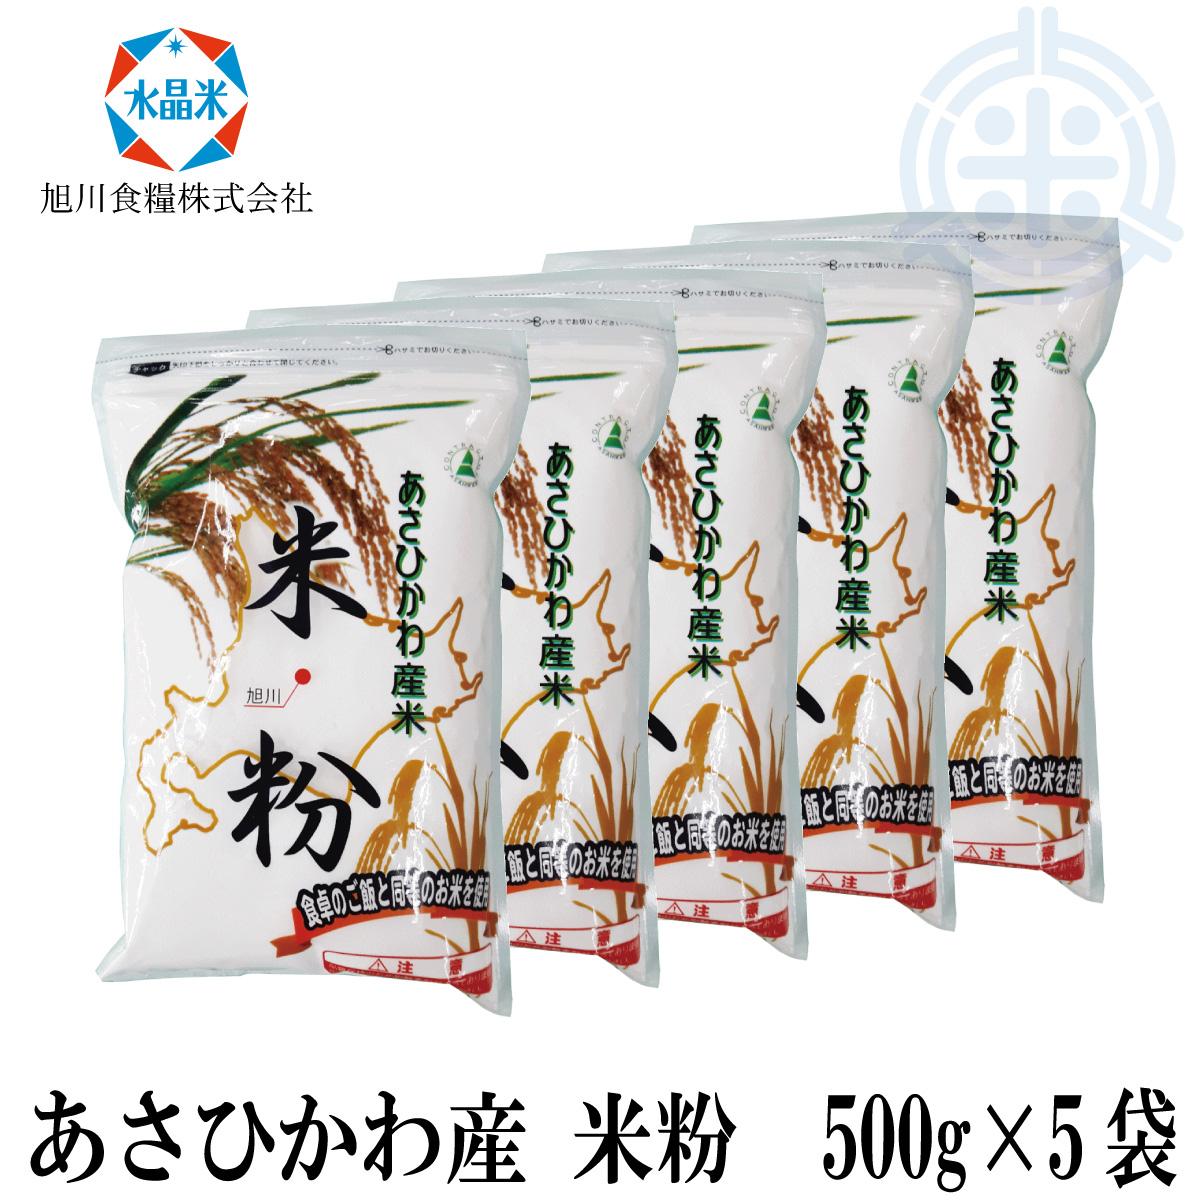 <title>北海道あさひかわ産米の米粉です 北海道産 米粉 2.5kg 500g×5袋 激安 旭川産米 メール便発送 送料無料</title>